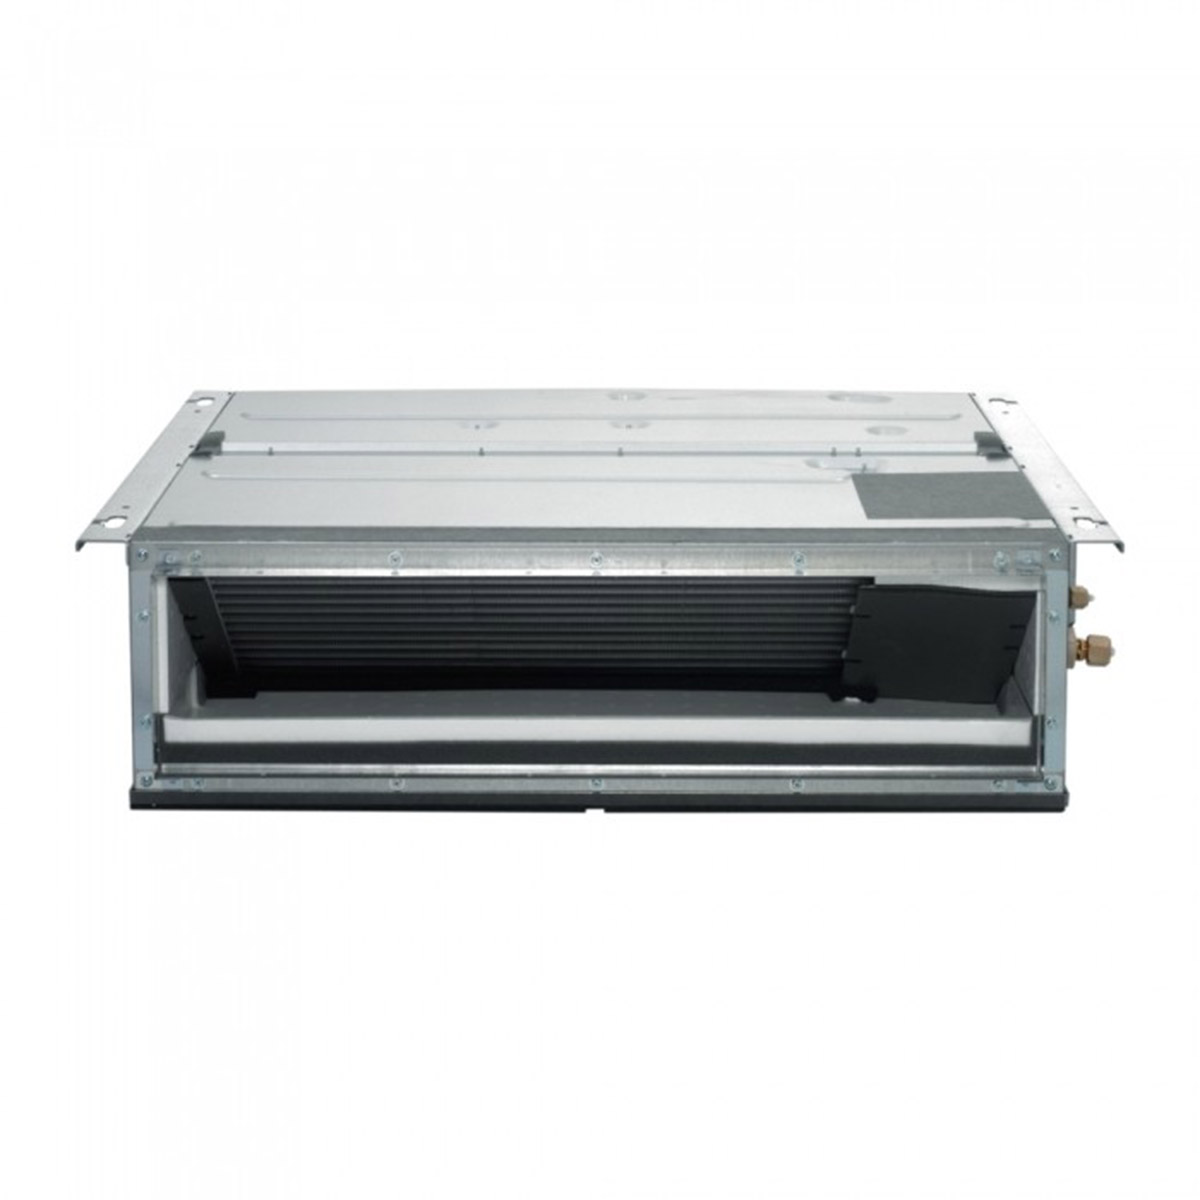 Aparat de aer conditinat tip duct Daikin SkyAir Alpha-series FDXM+RZAG Inverter, R23, Clasa A+ 10